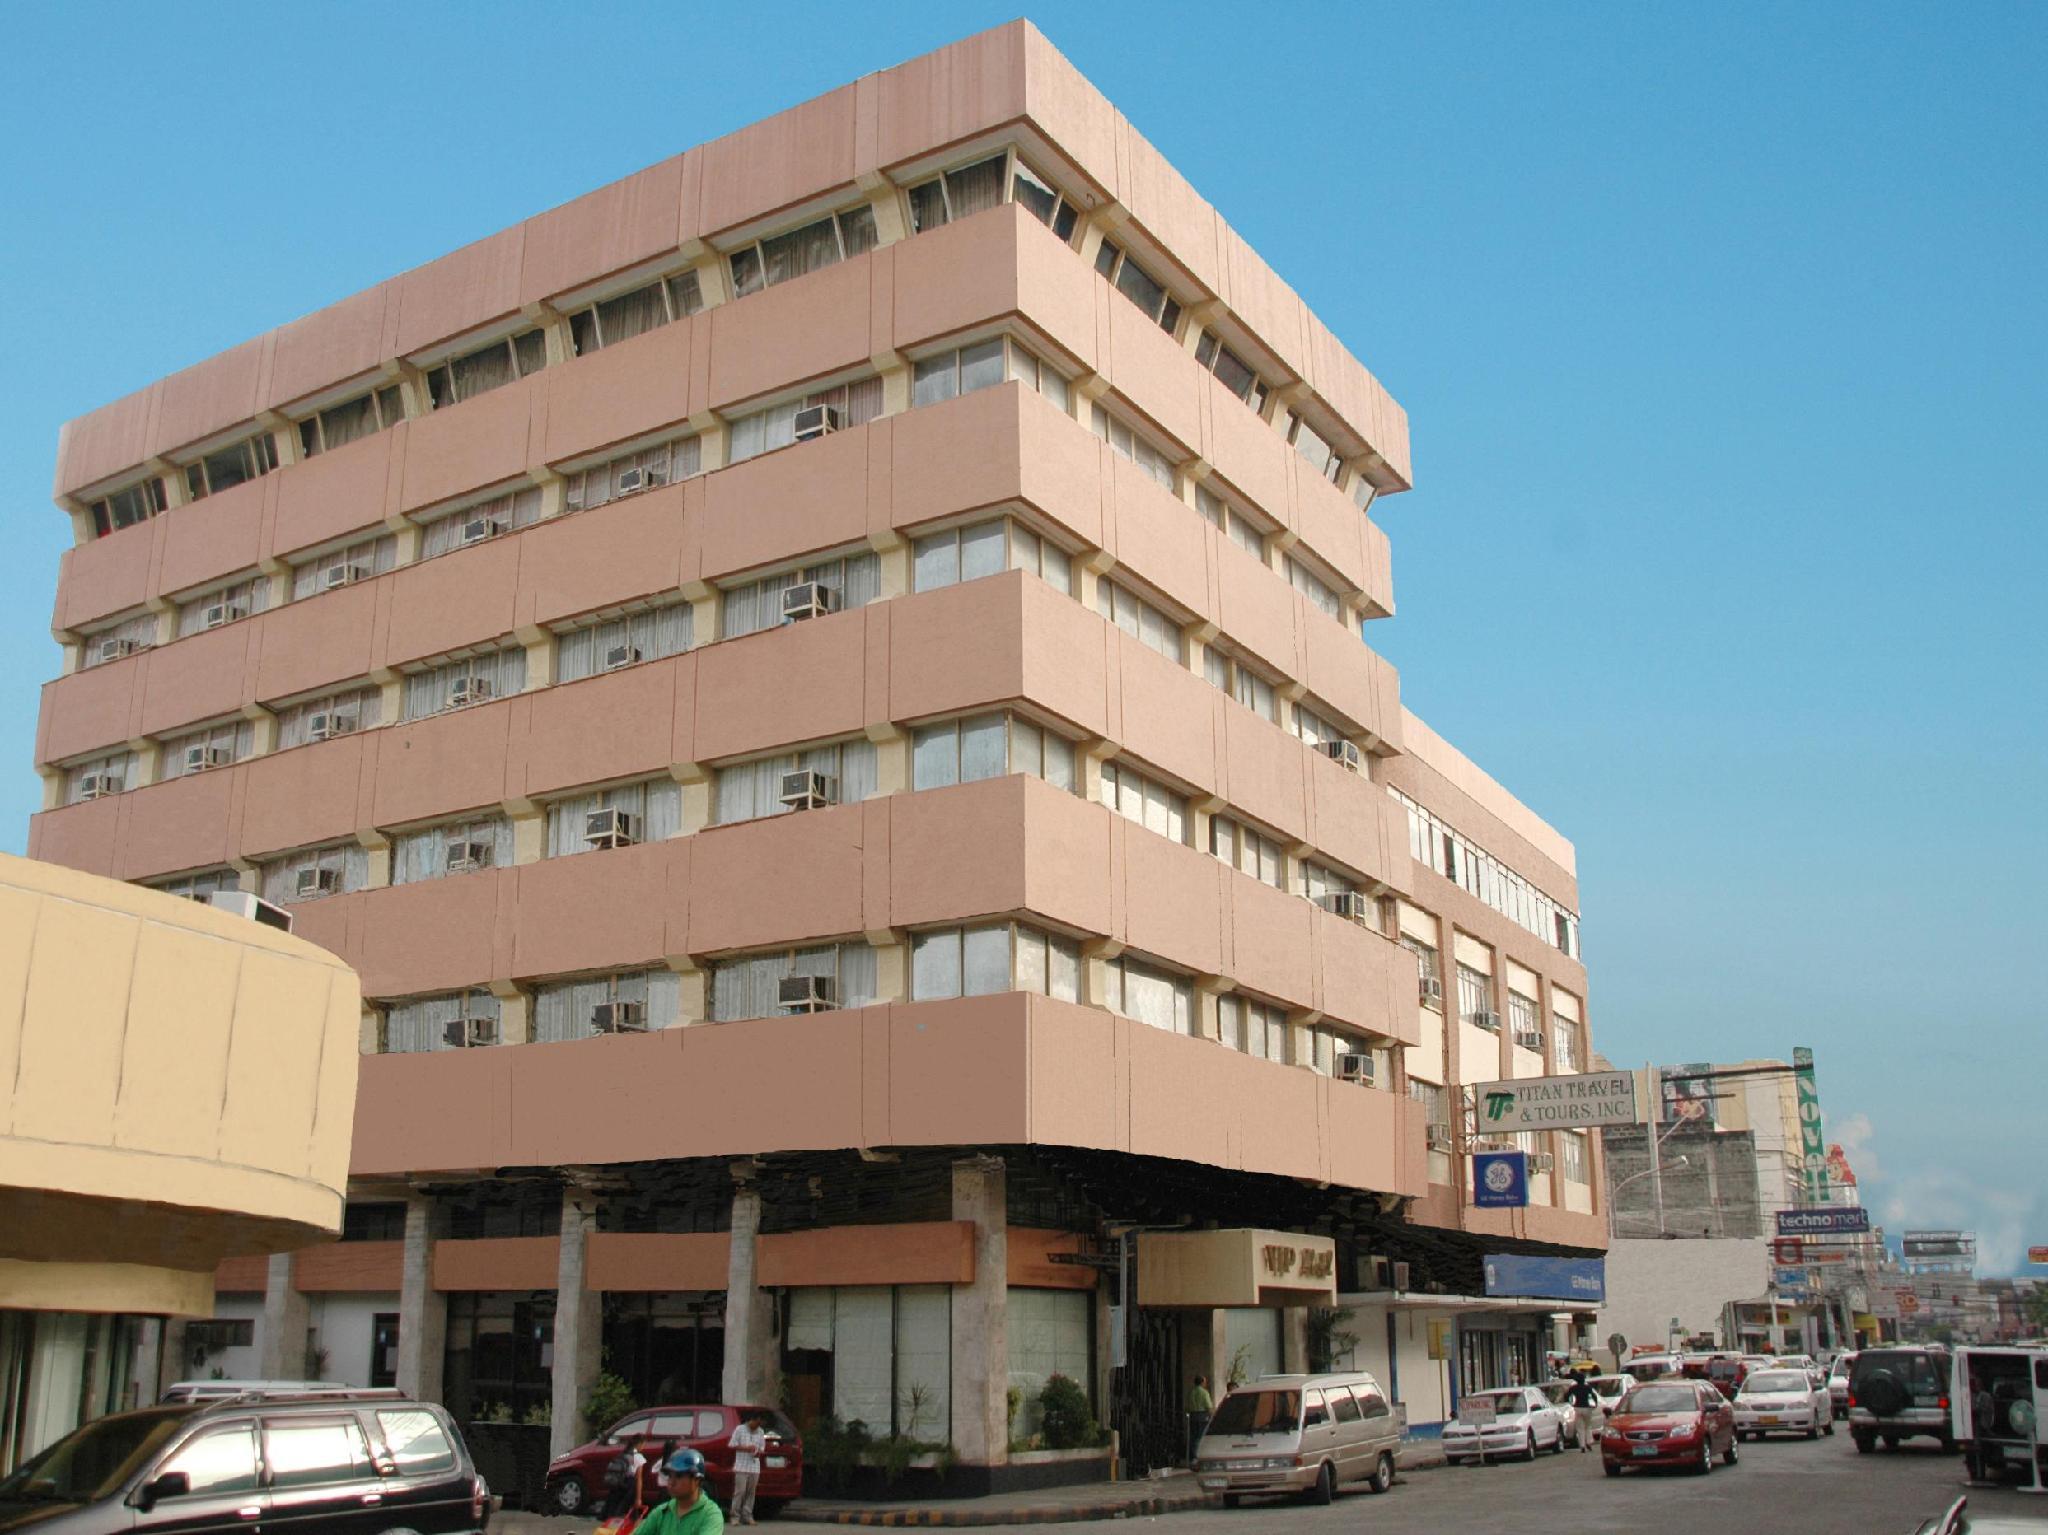 The VIP Hotel 1